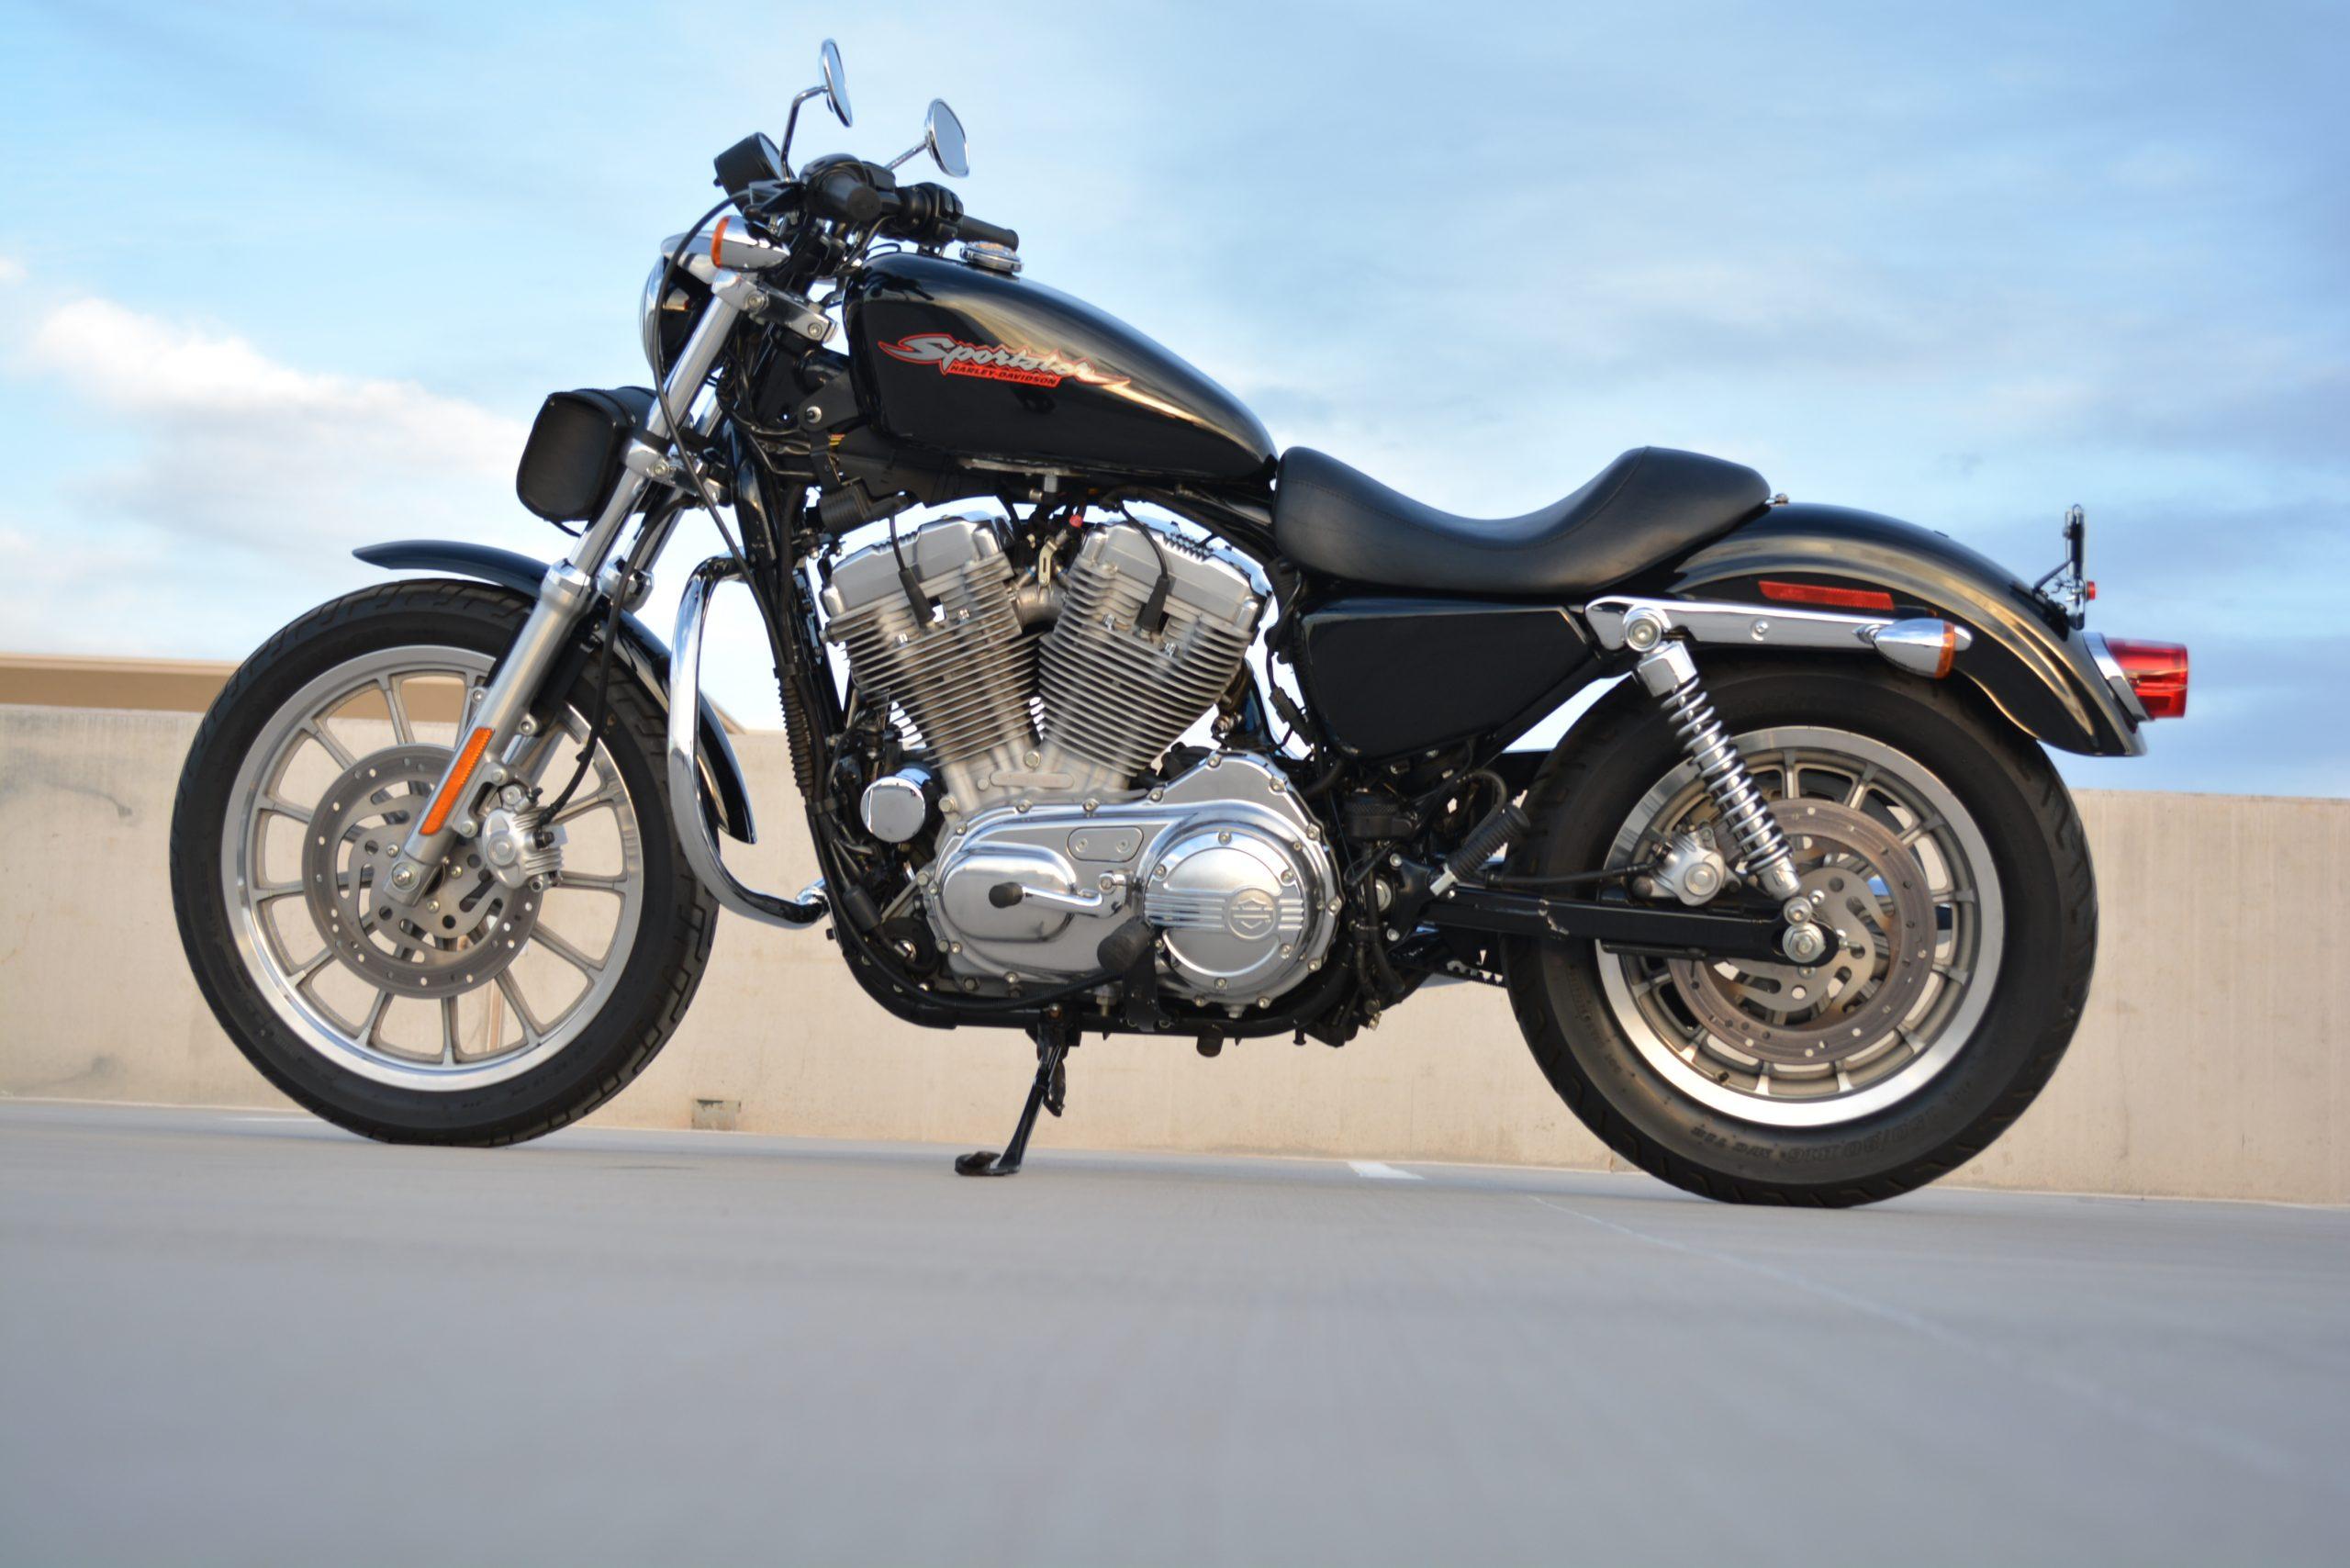 Harley-Davidson XL 1200S Sportster  2000